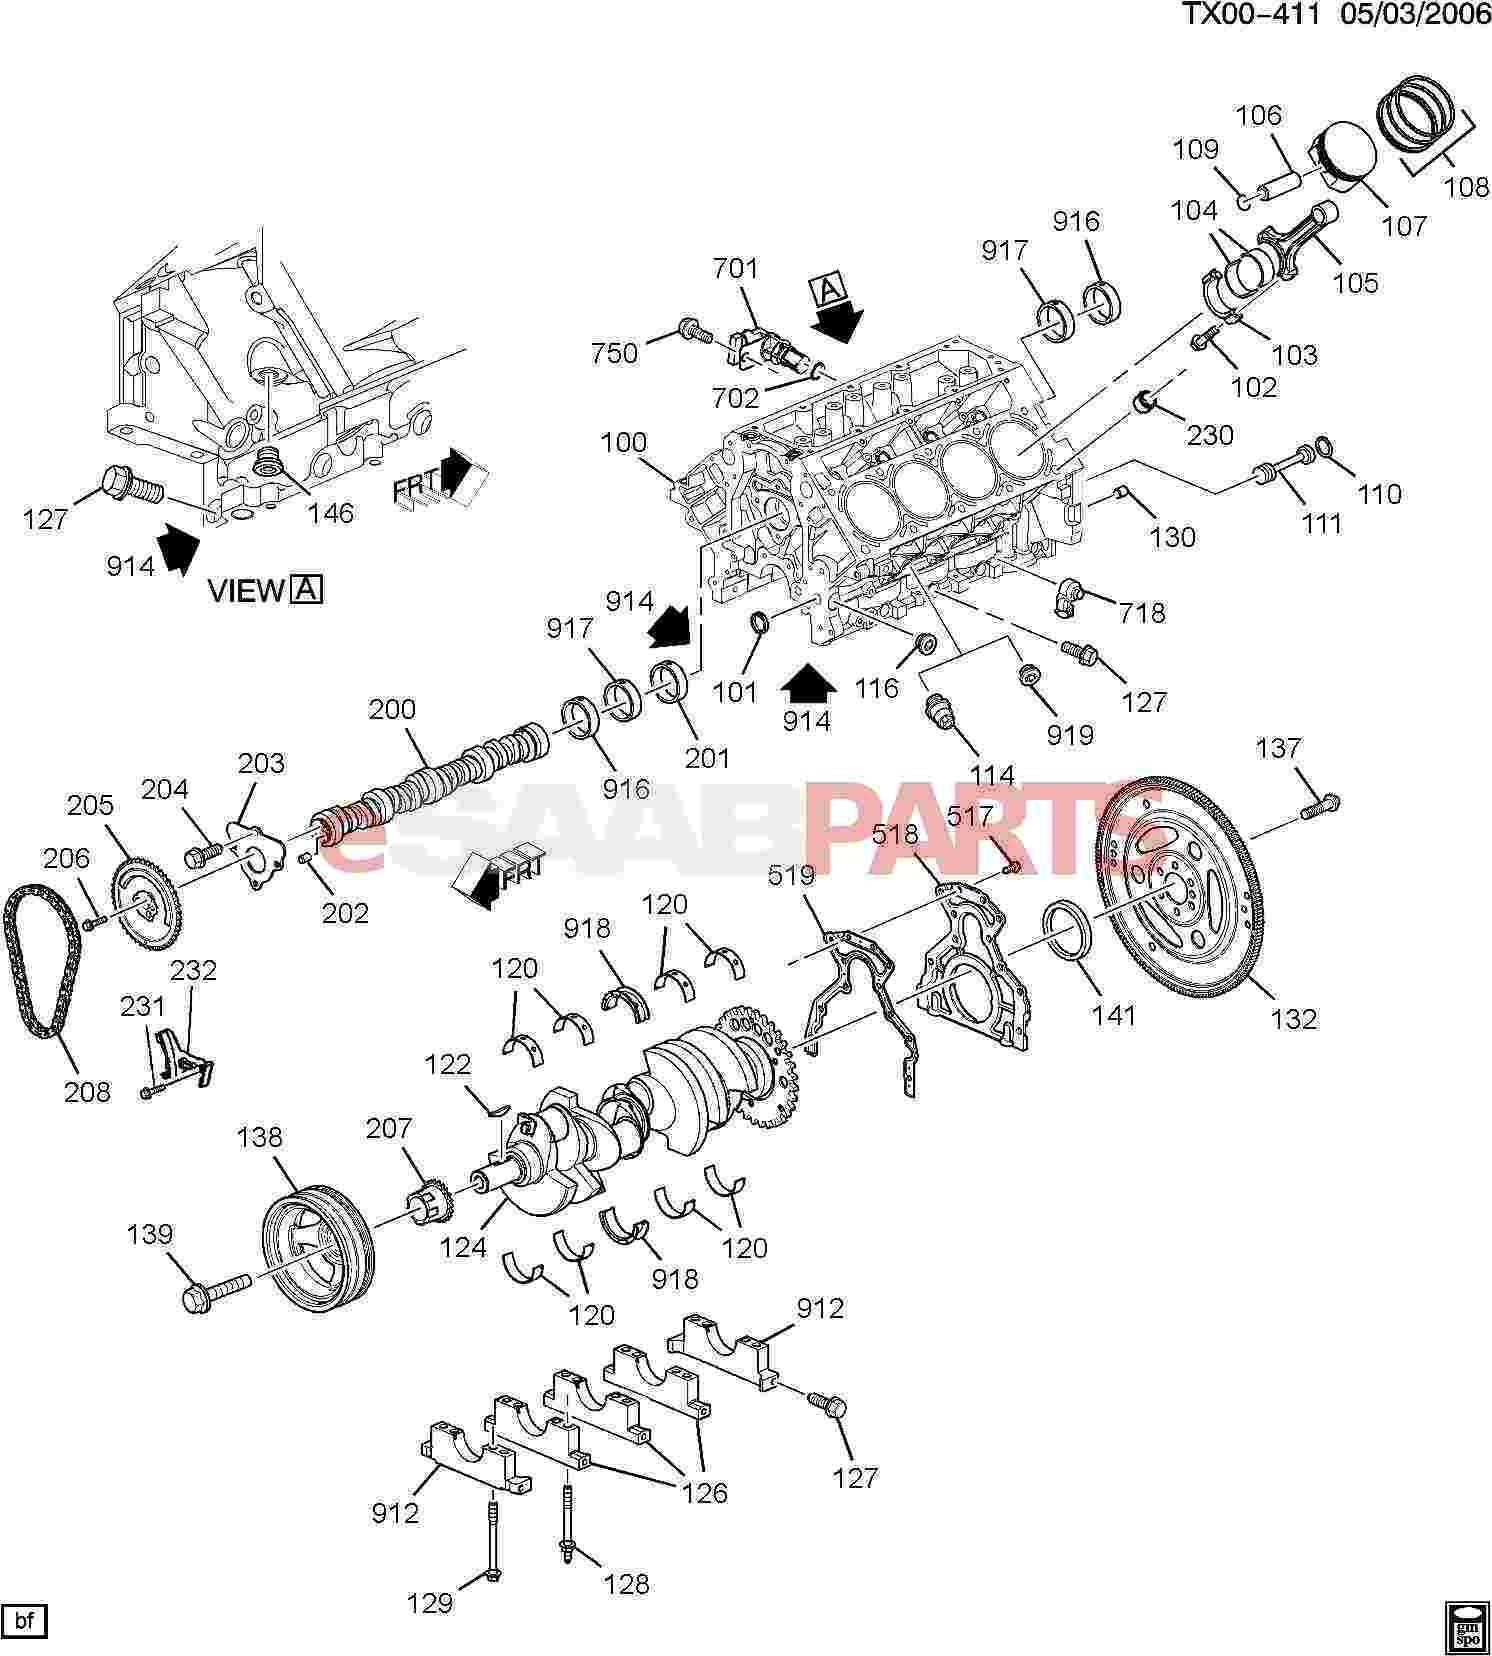 v8 engine parts diagram 1997 7 3l engine diagram experts